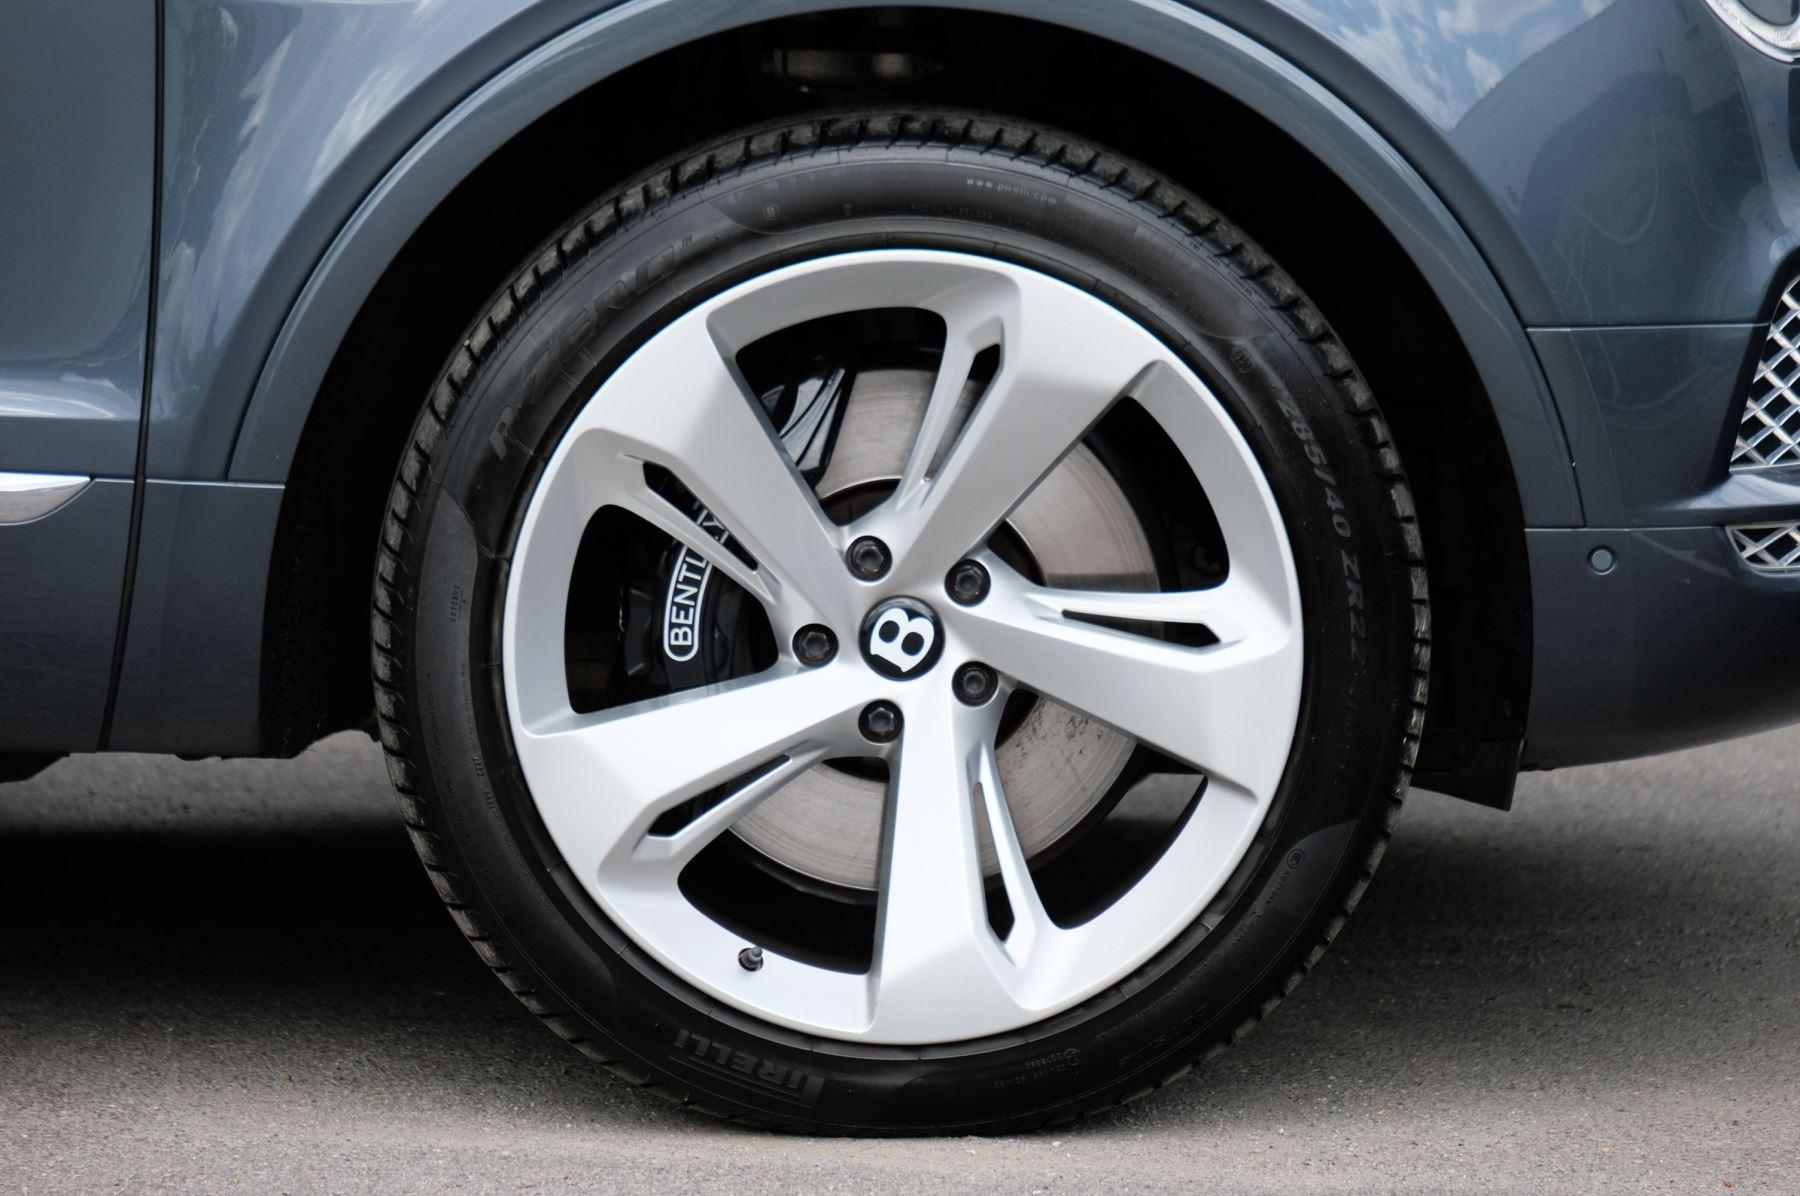 Bentley Bentayga 4.0 V8 5dr - Mulliner Driving Specification - City & Tour Specification image 11